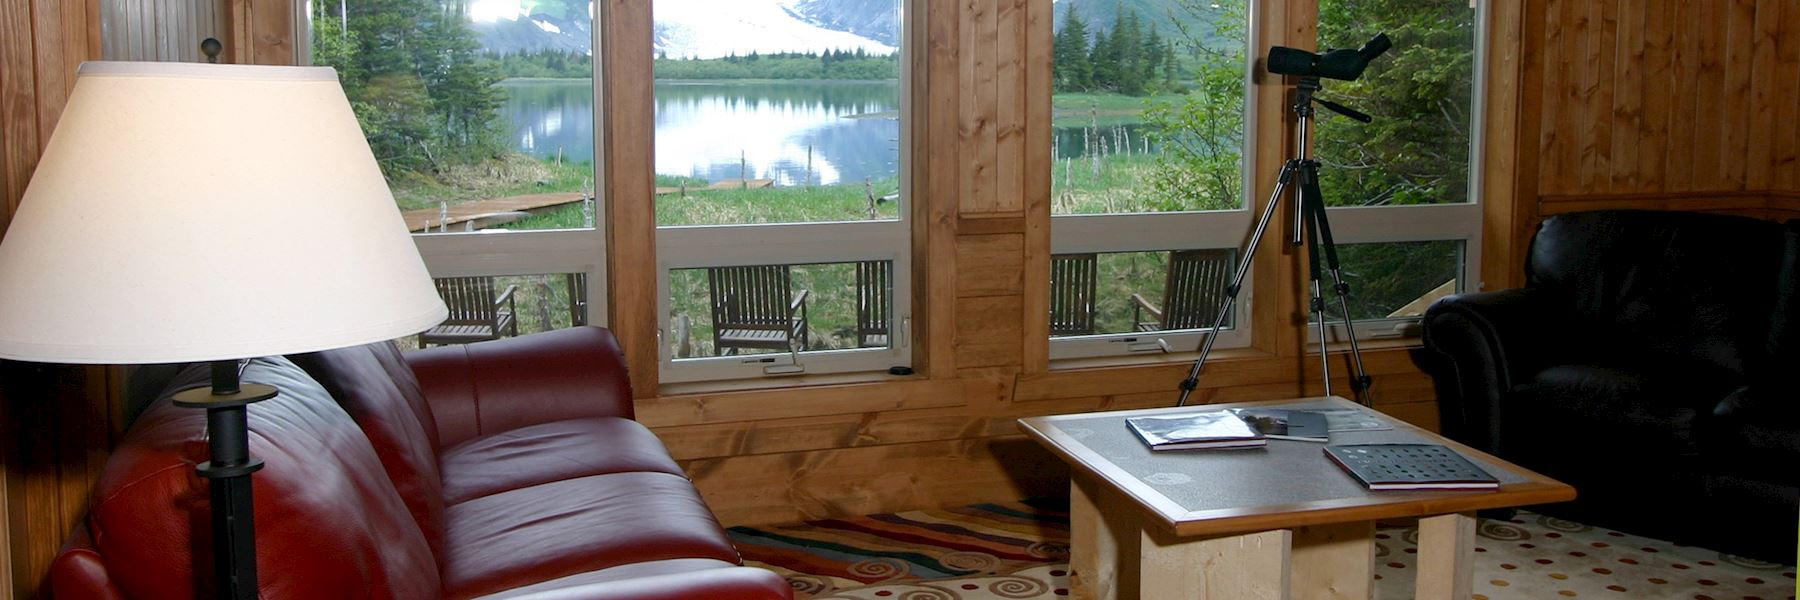 Kenal Fjords Glacier Lodge